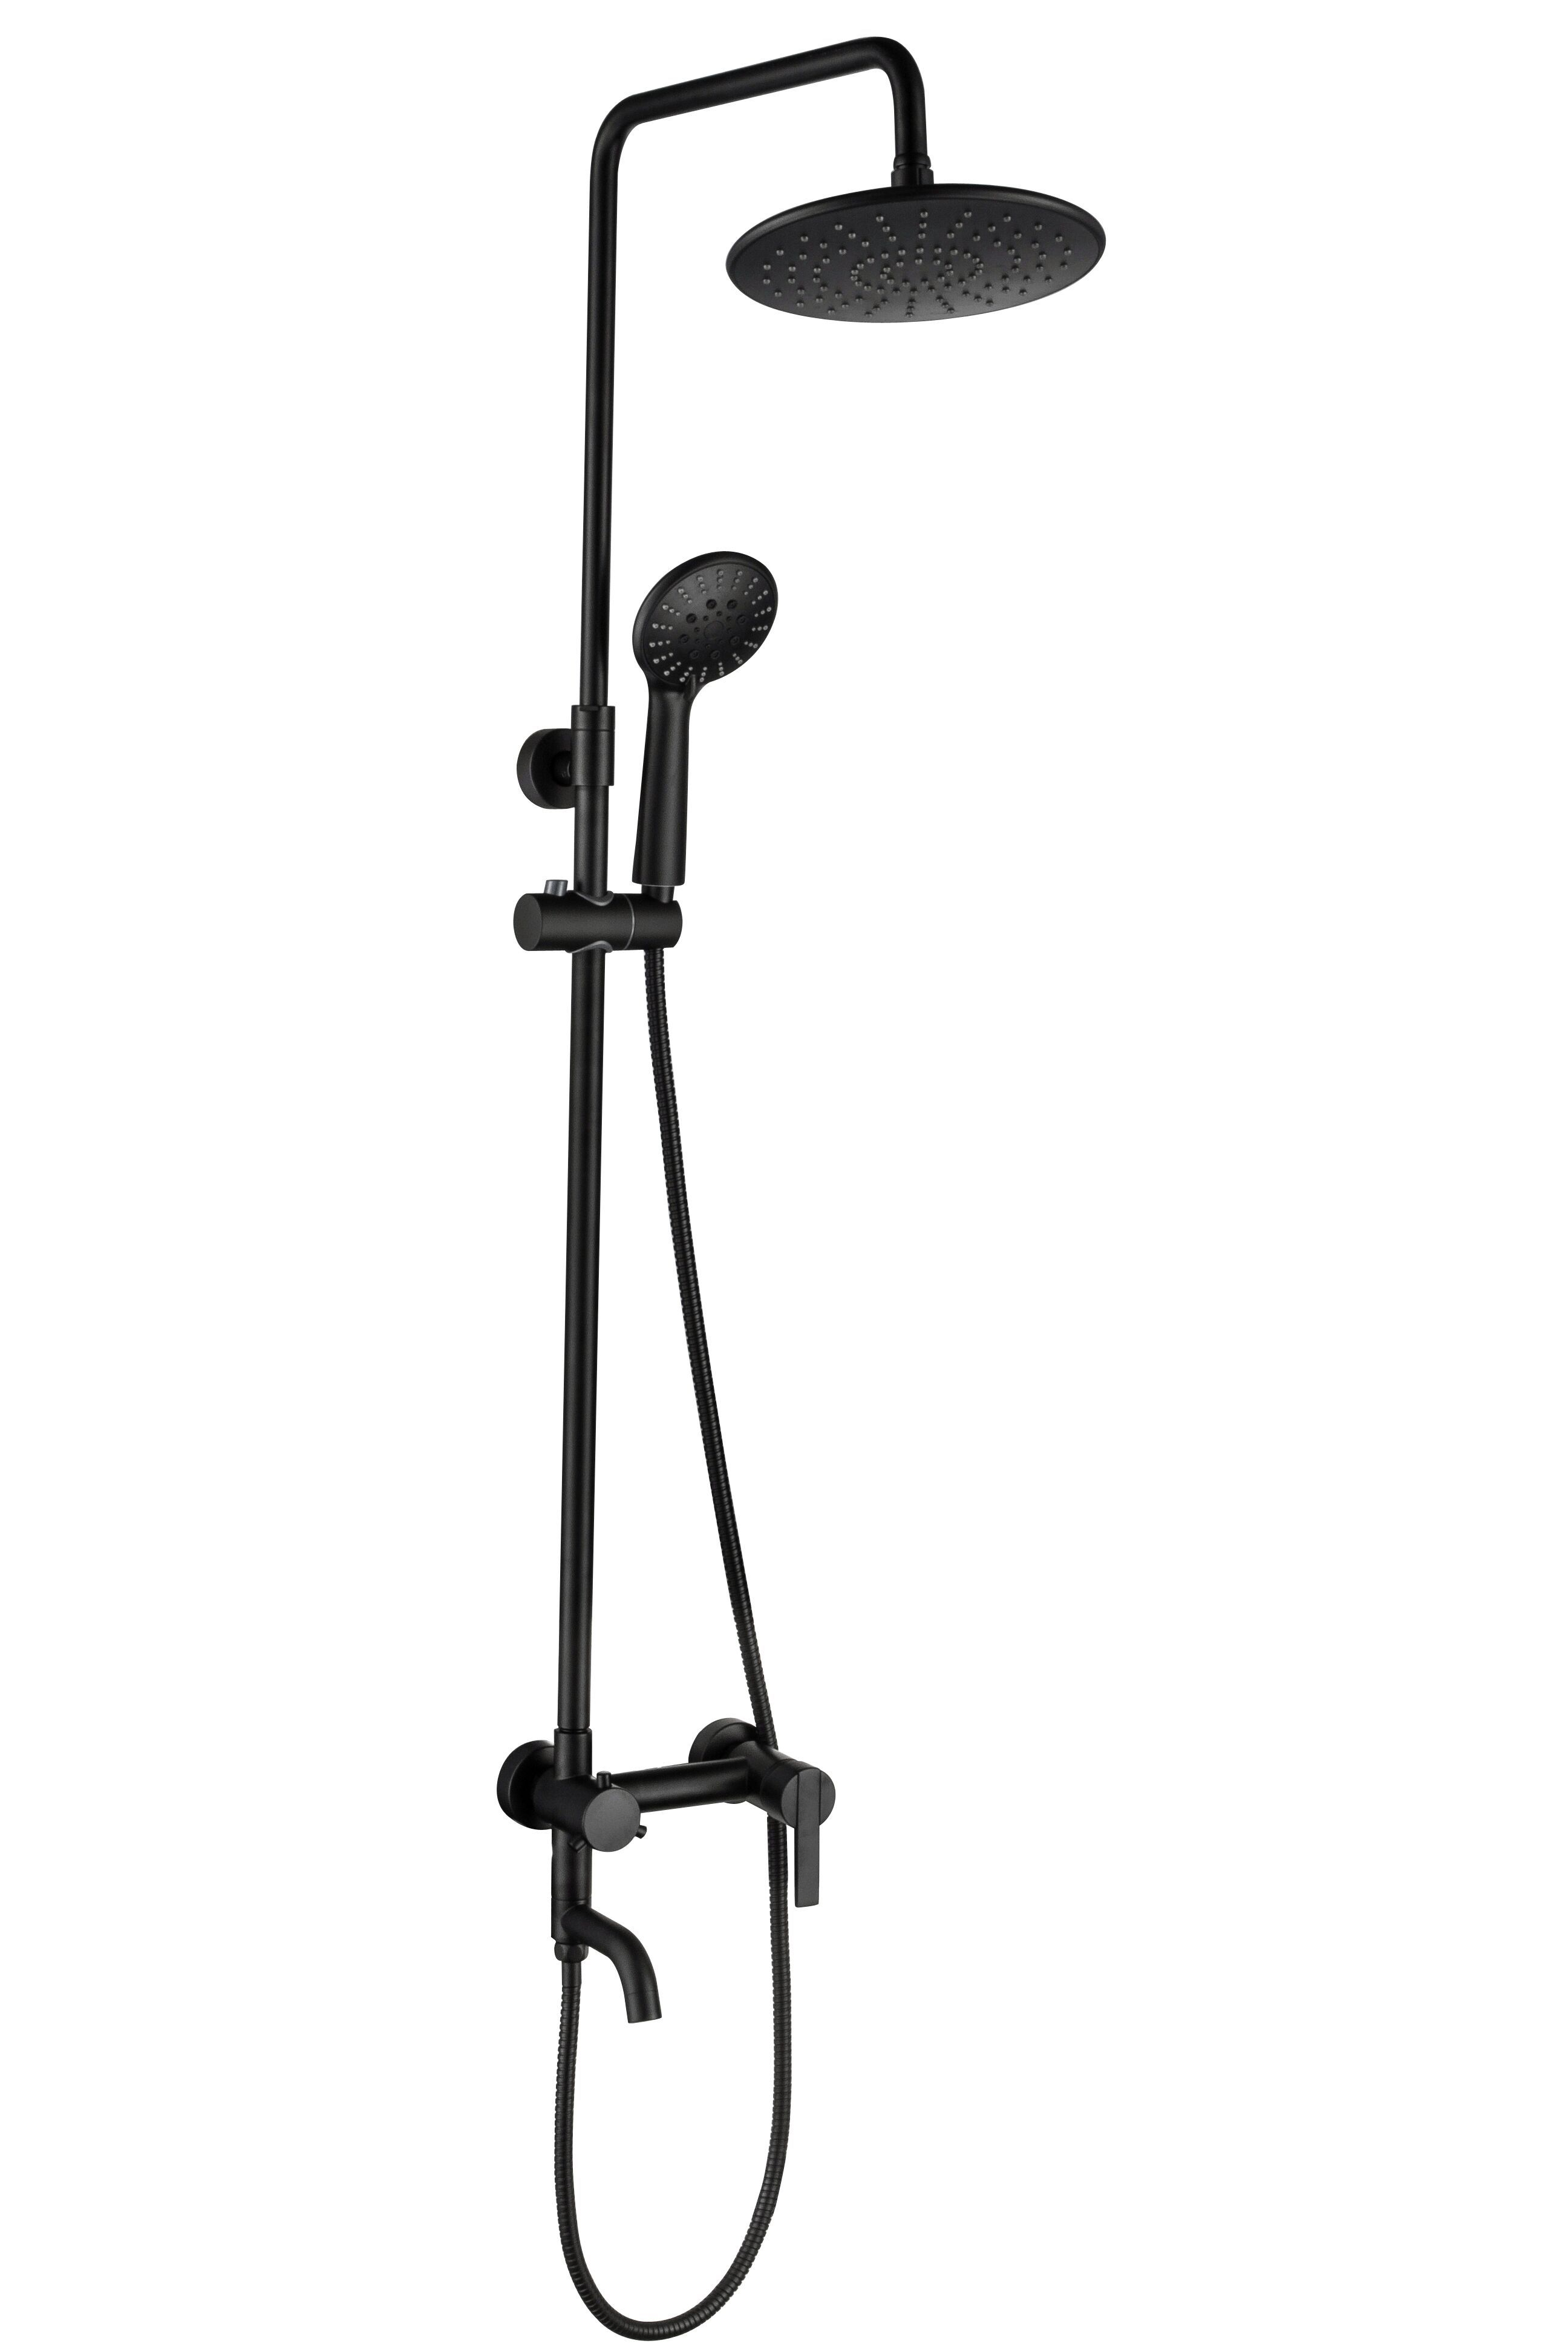 New Design Matte Black Bathroom Shower Faucet 9 Rainfall Shower